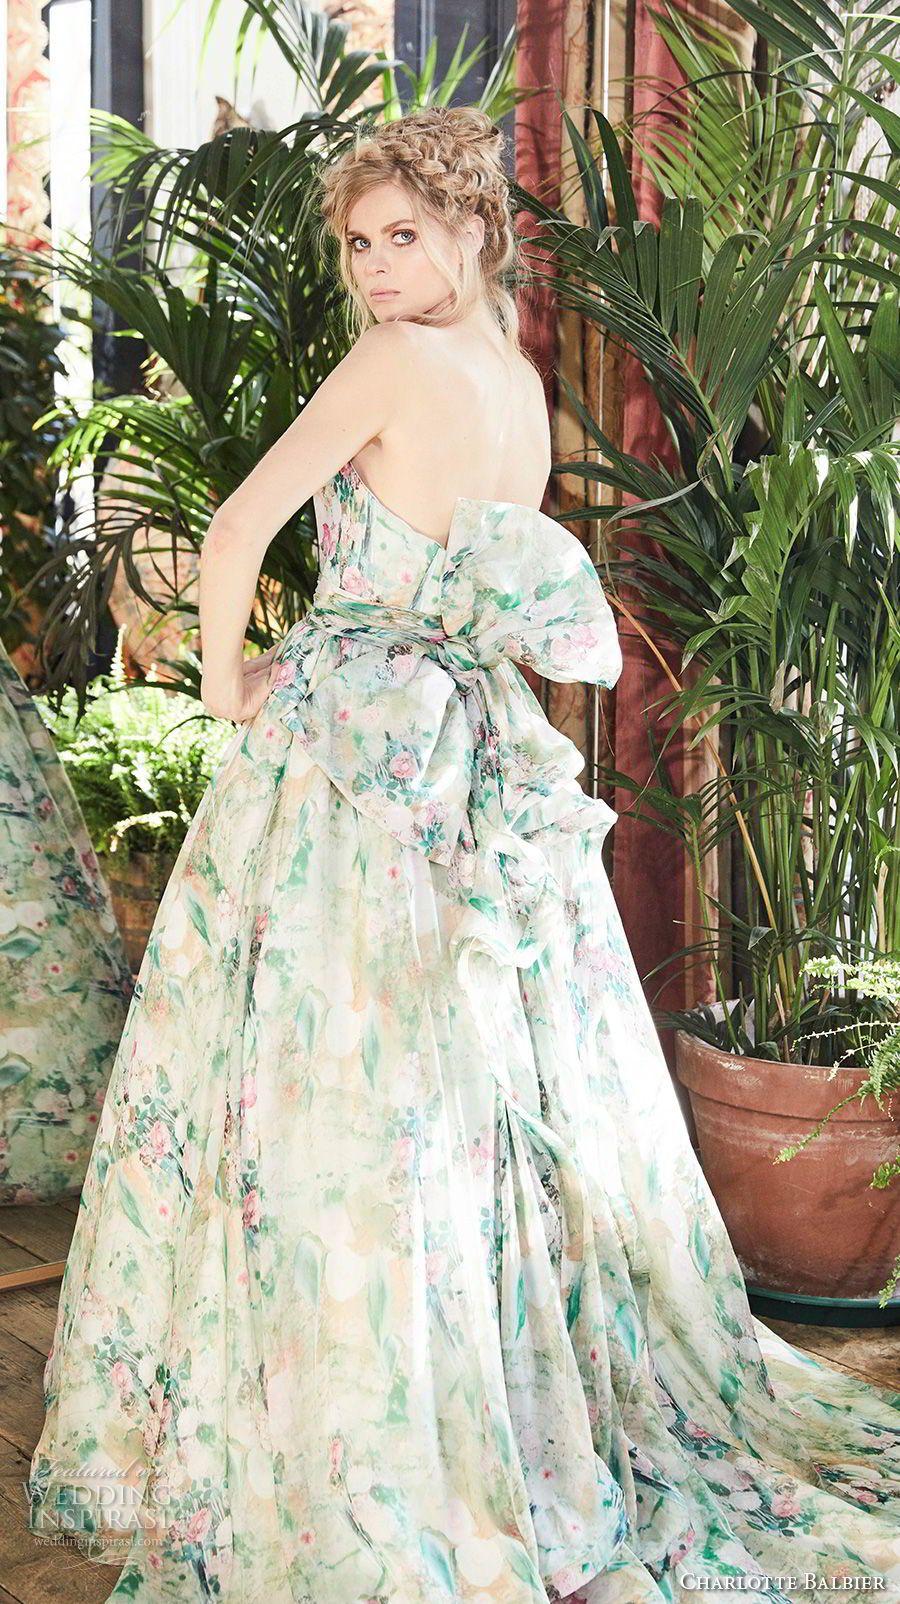 Randy fenoli wedding dresses  Charlotte Balbier  Wedding Dresses u ucBohemian Blushud Bridal